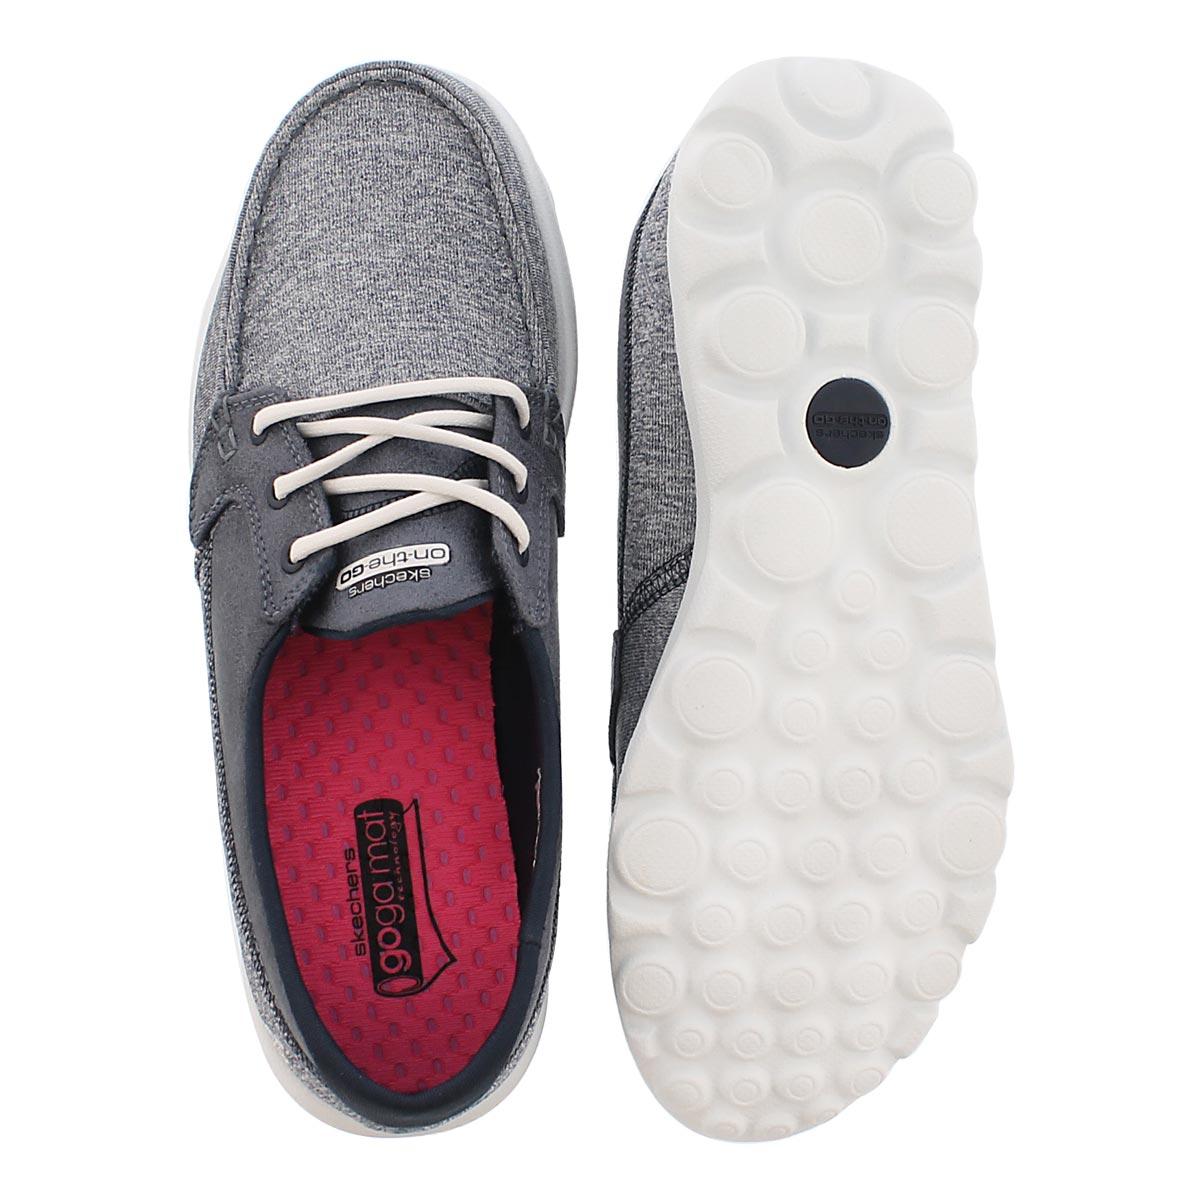 Lds Headsail navy 3 eye boat shoe